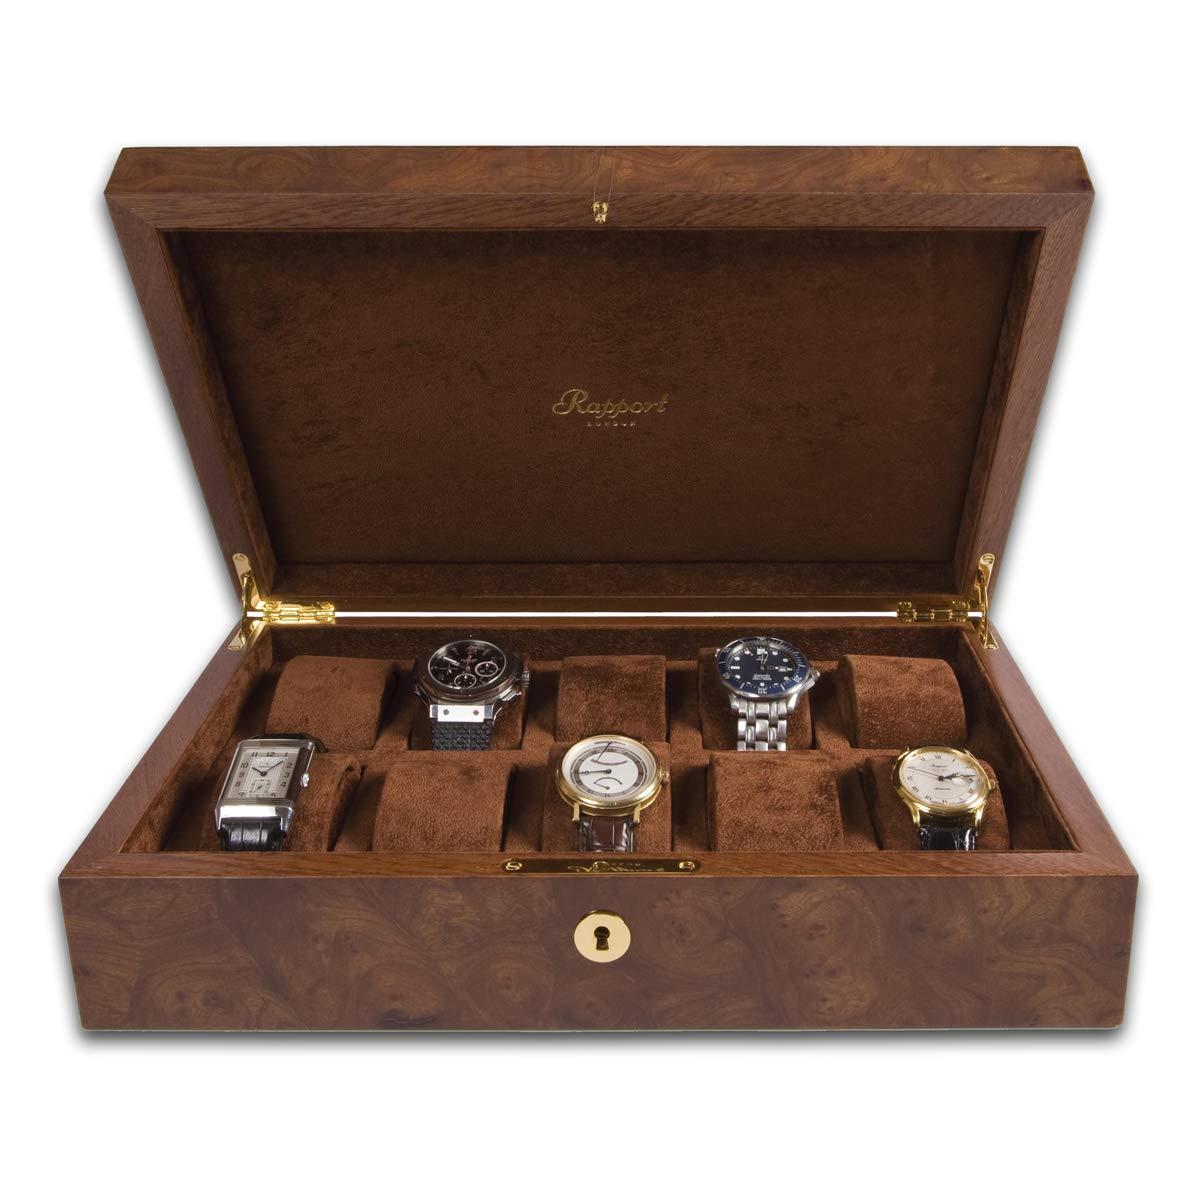 Rapport Heritage 10 Watch Collector Case - Walnut Burl